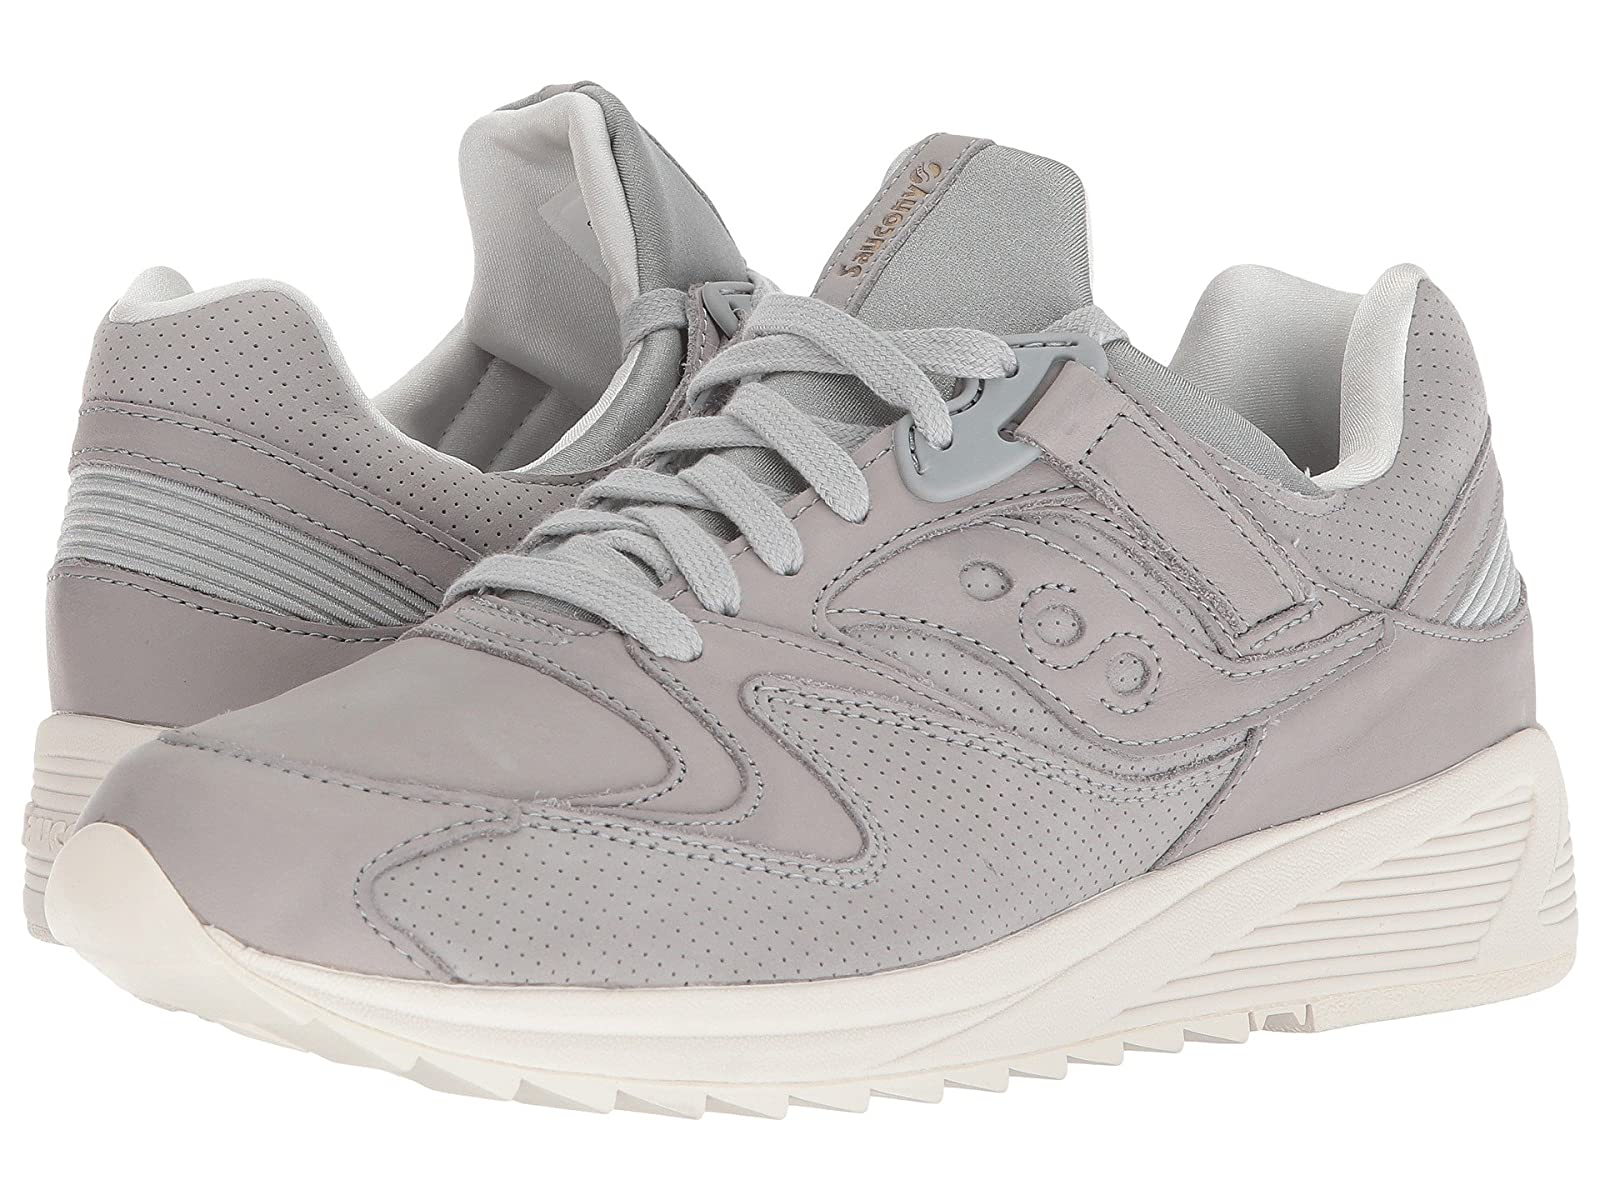 Saucony Originals Grid 8500 HTCheap and distinctive eye-catching shoes